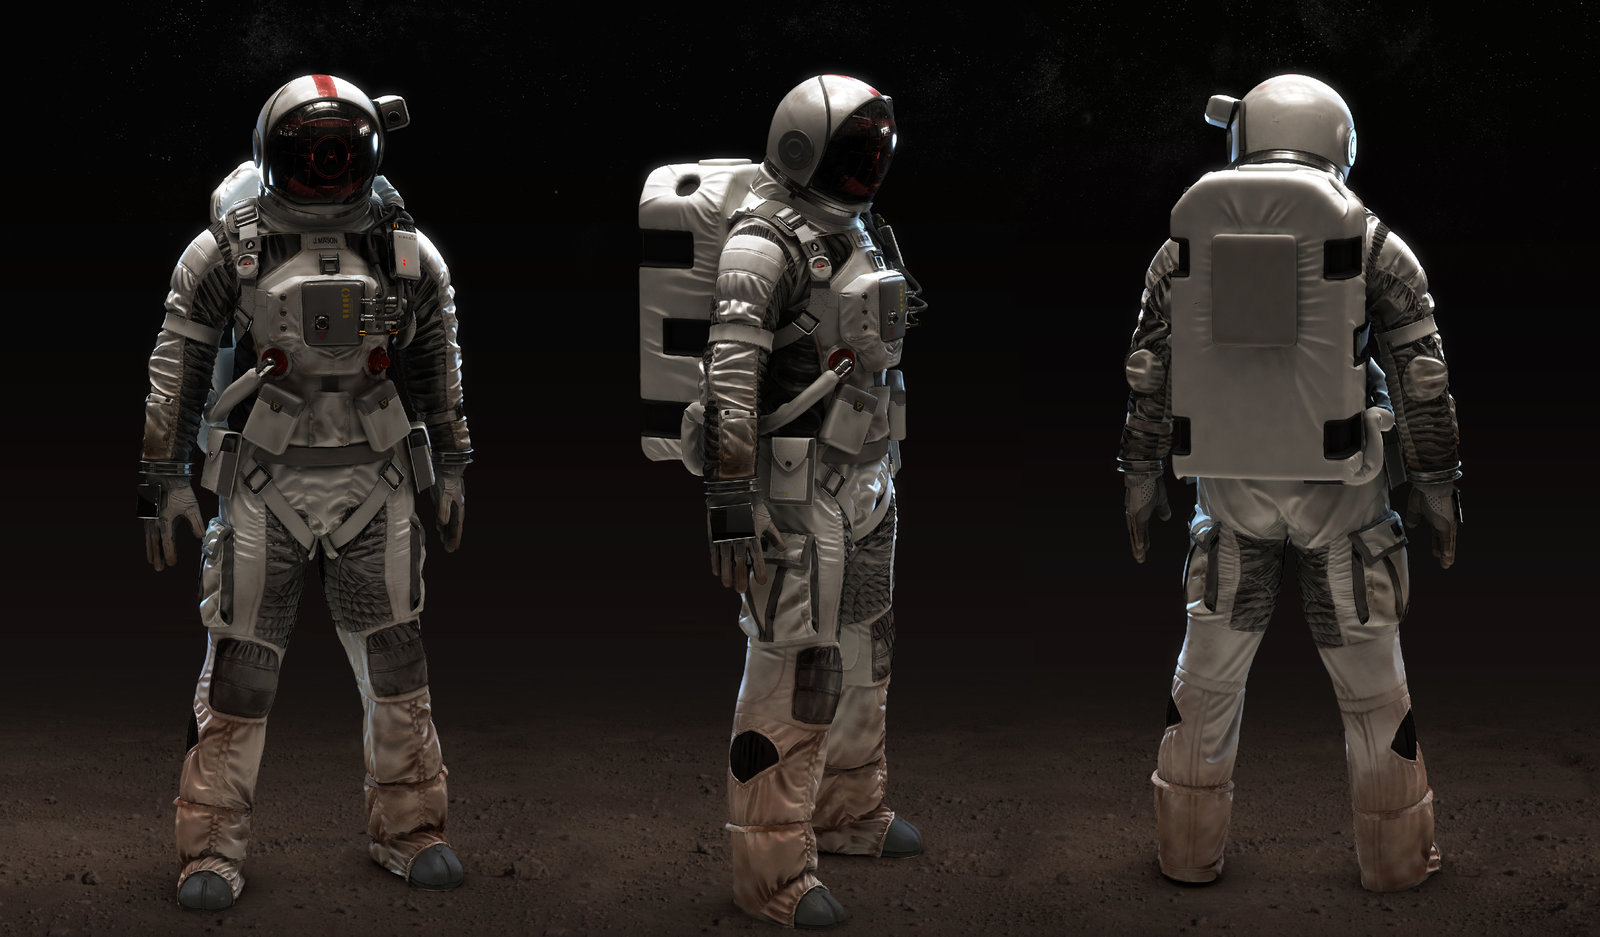 Astronaut02